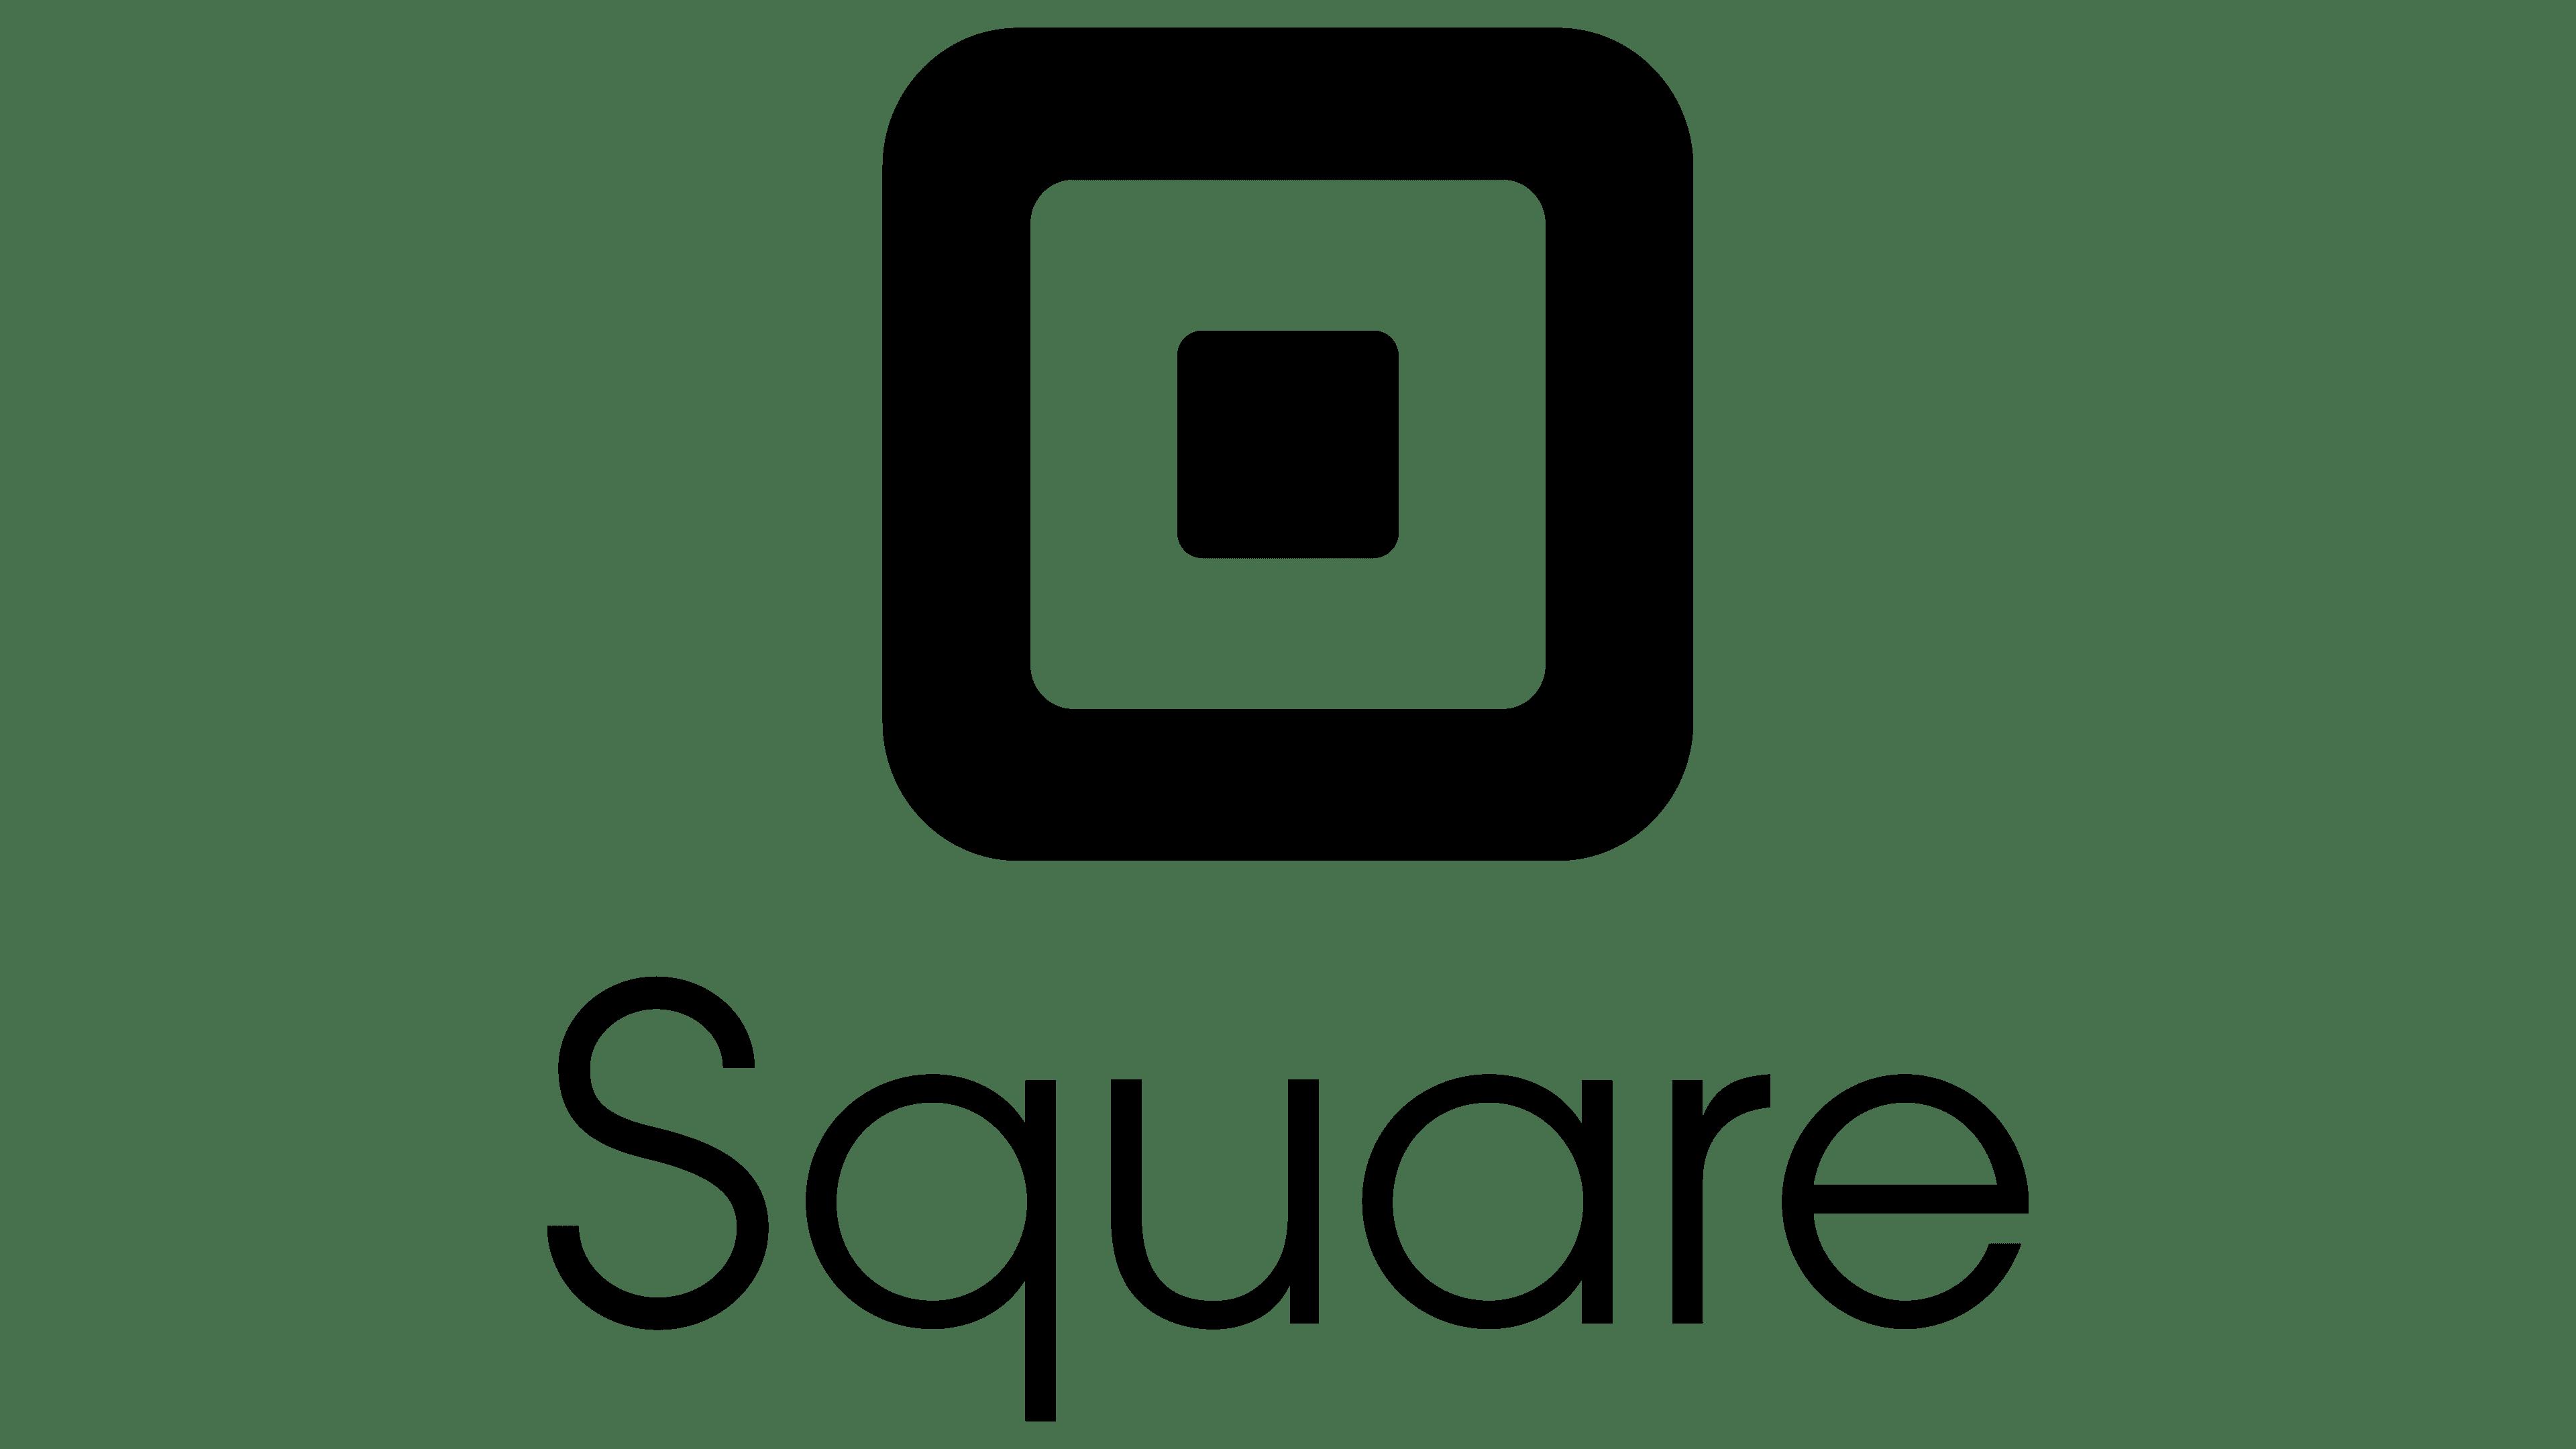 Square Logo | Symbol, History, PNG (3840*2160)